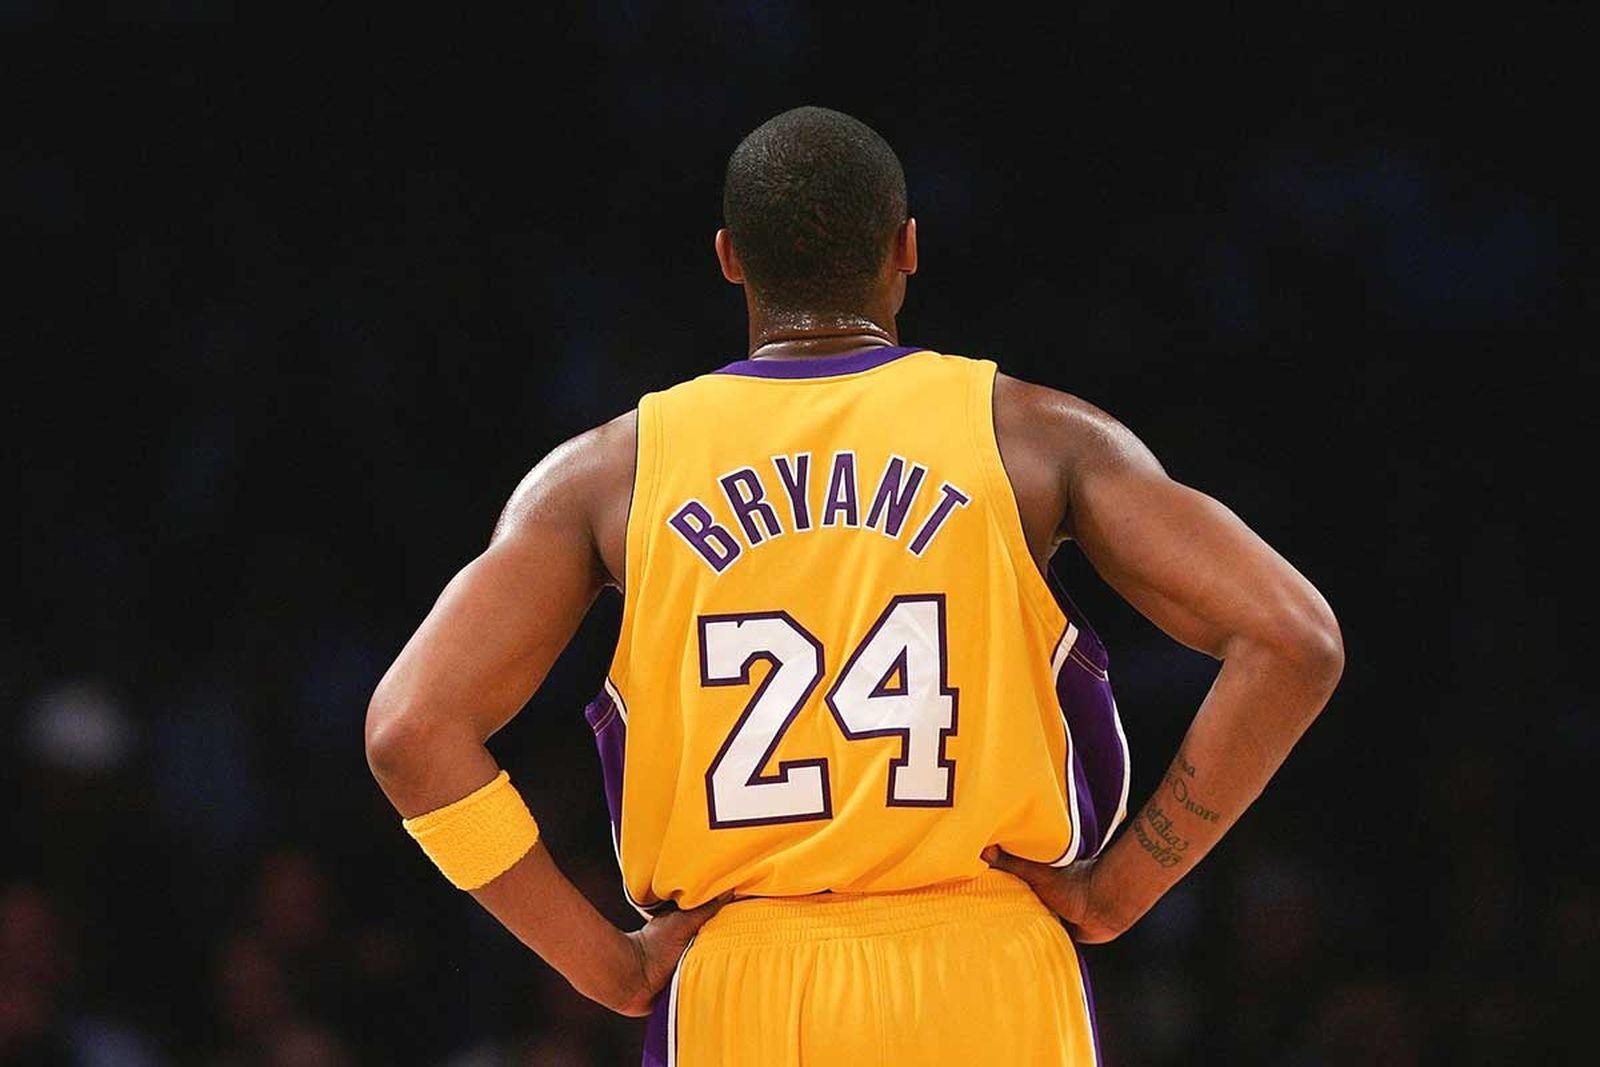 Kobe Bryant wearing the #24 Lakers jersey